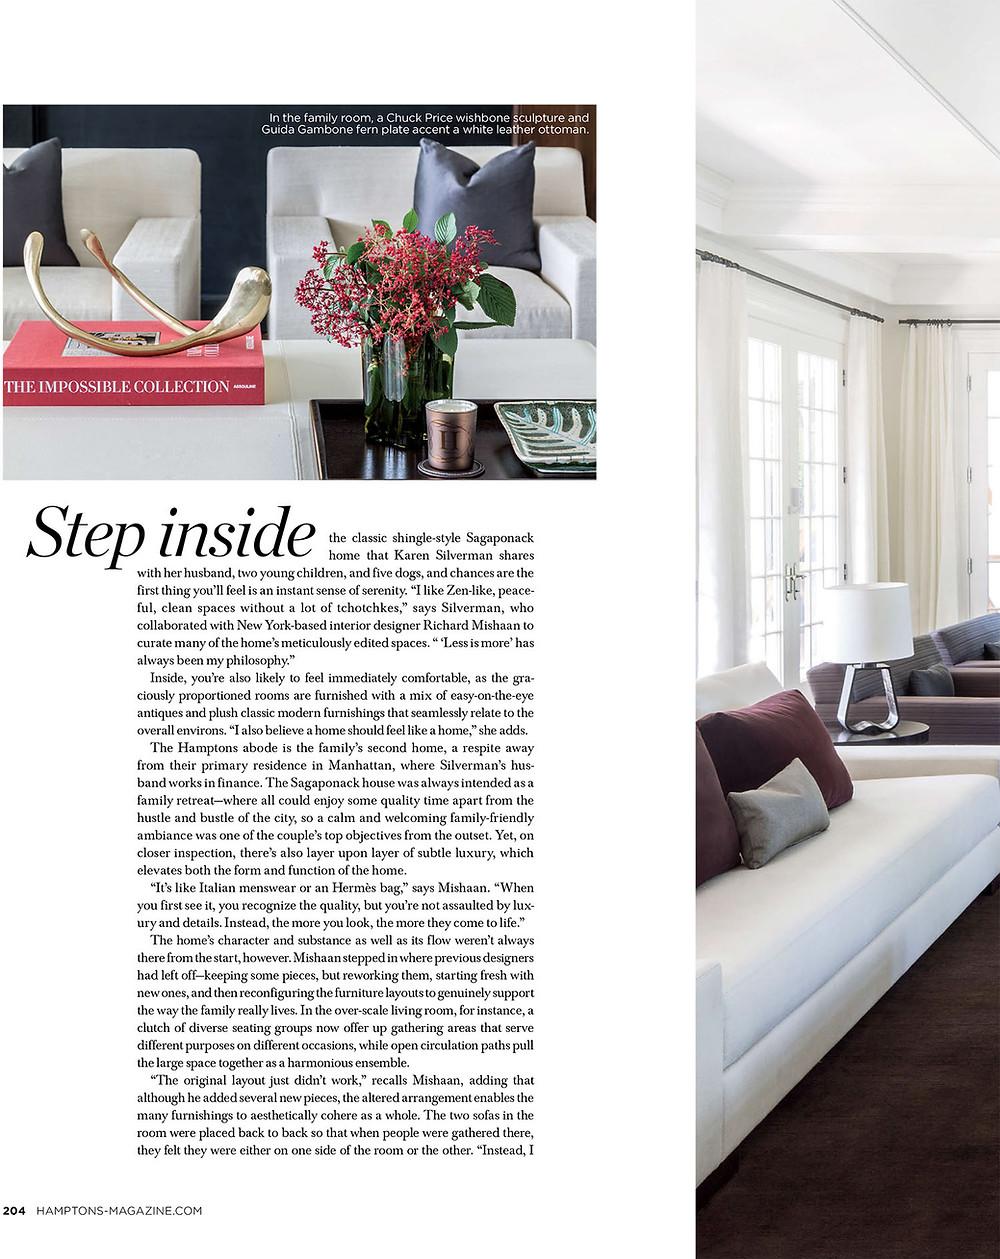 Richard Mishaan Hamptons Magazine